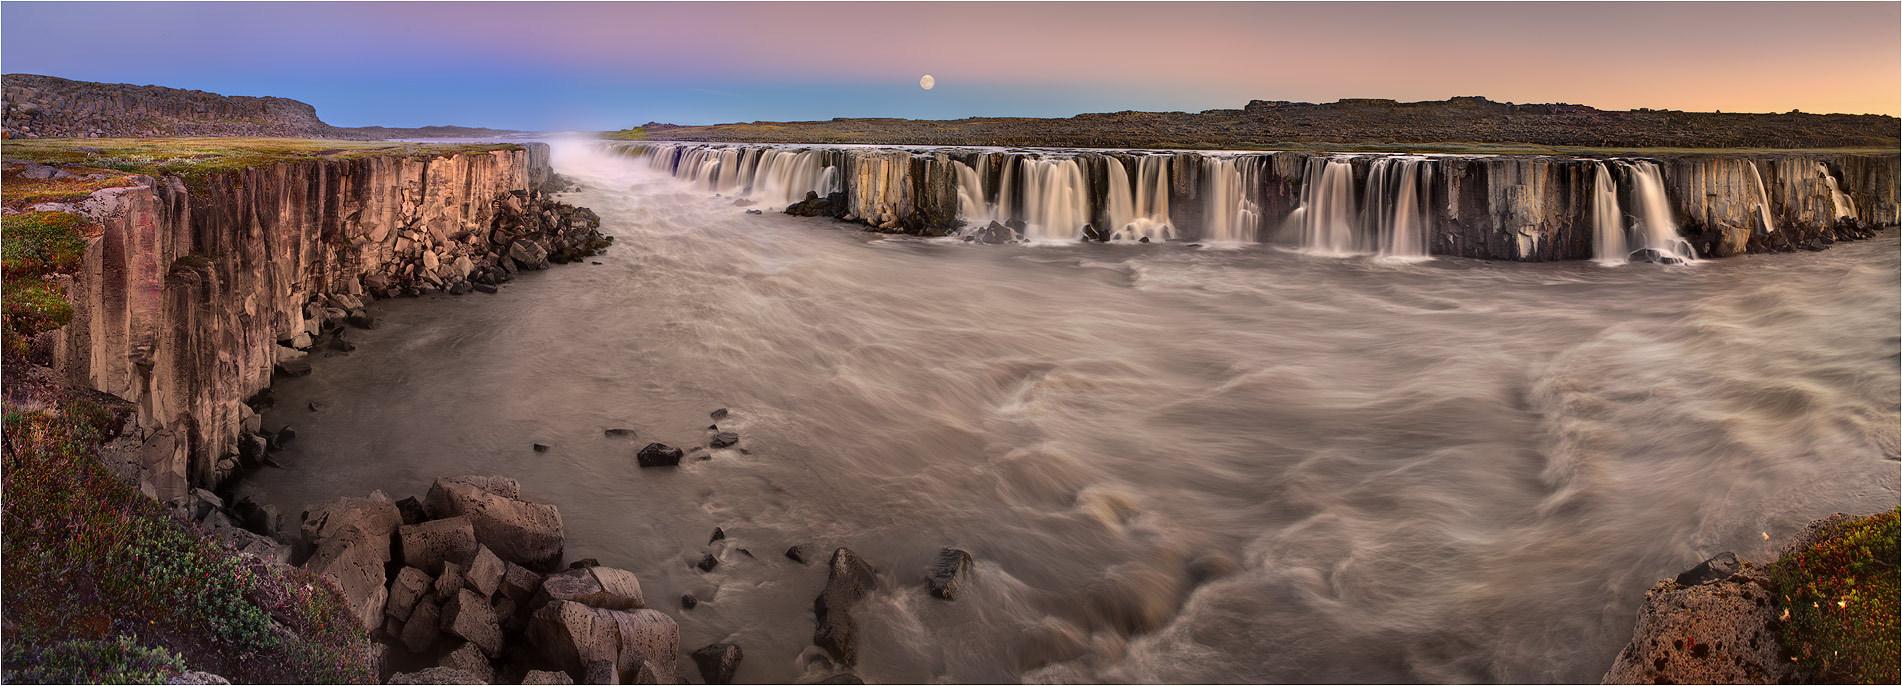 numerous waterfalls | waterfall, mist, dusk, hills